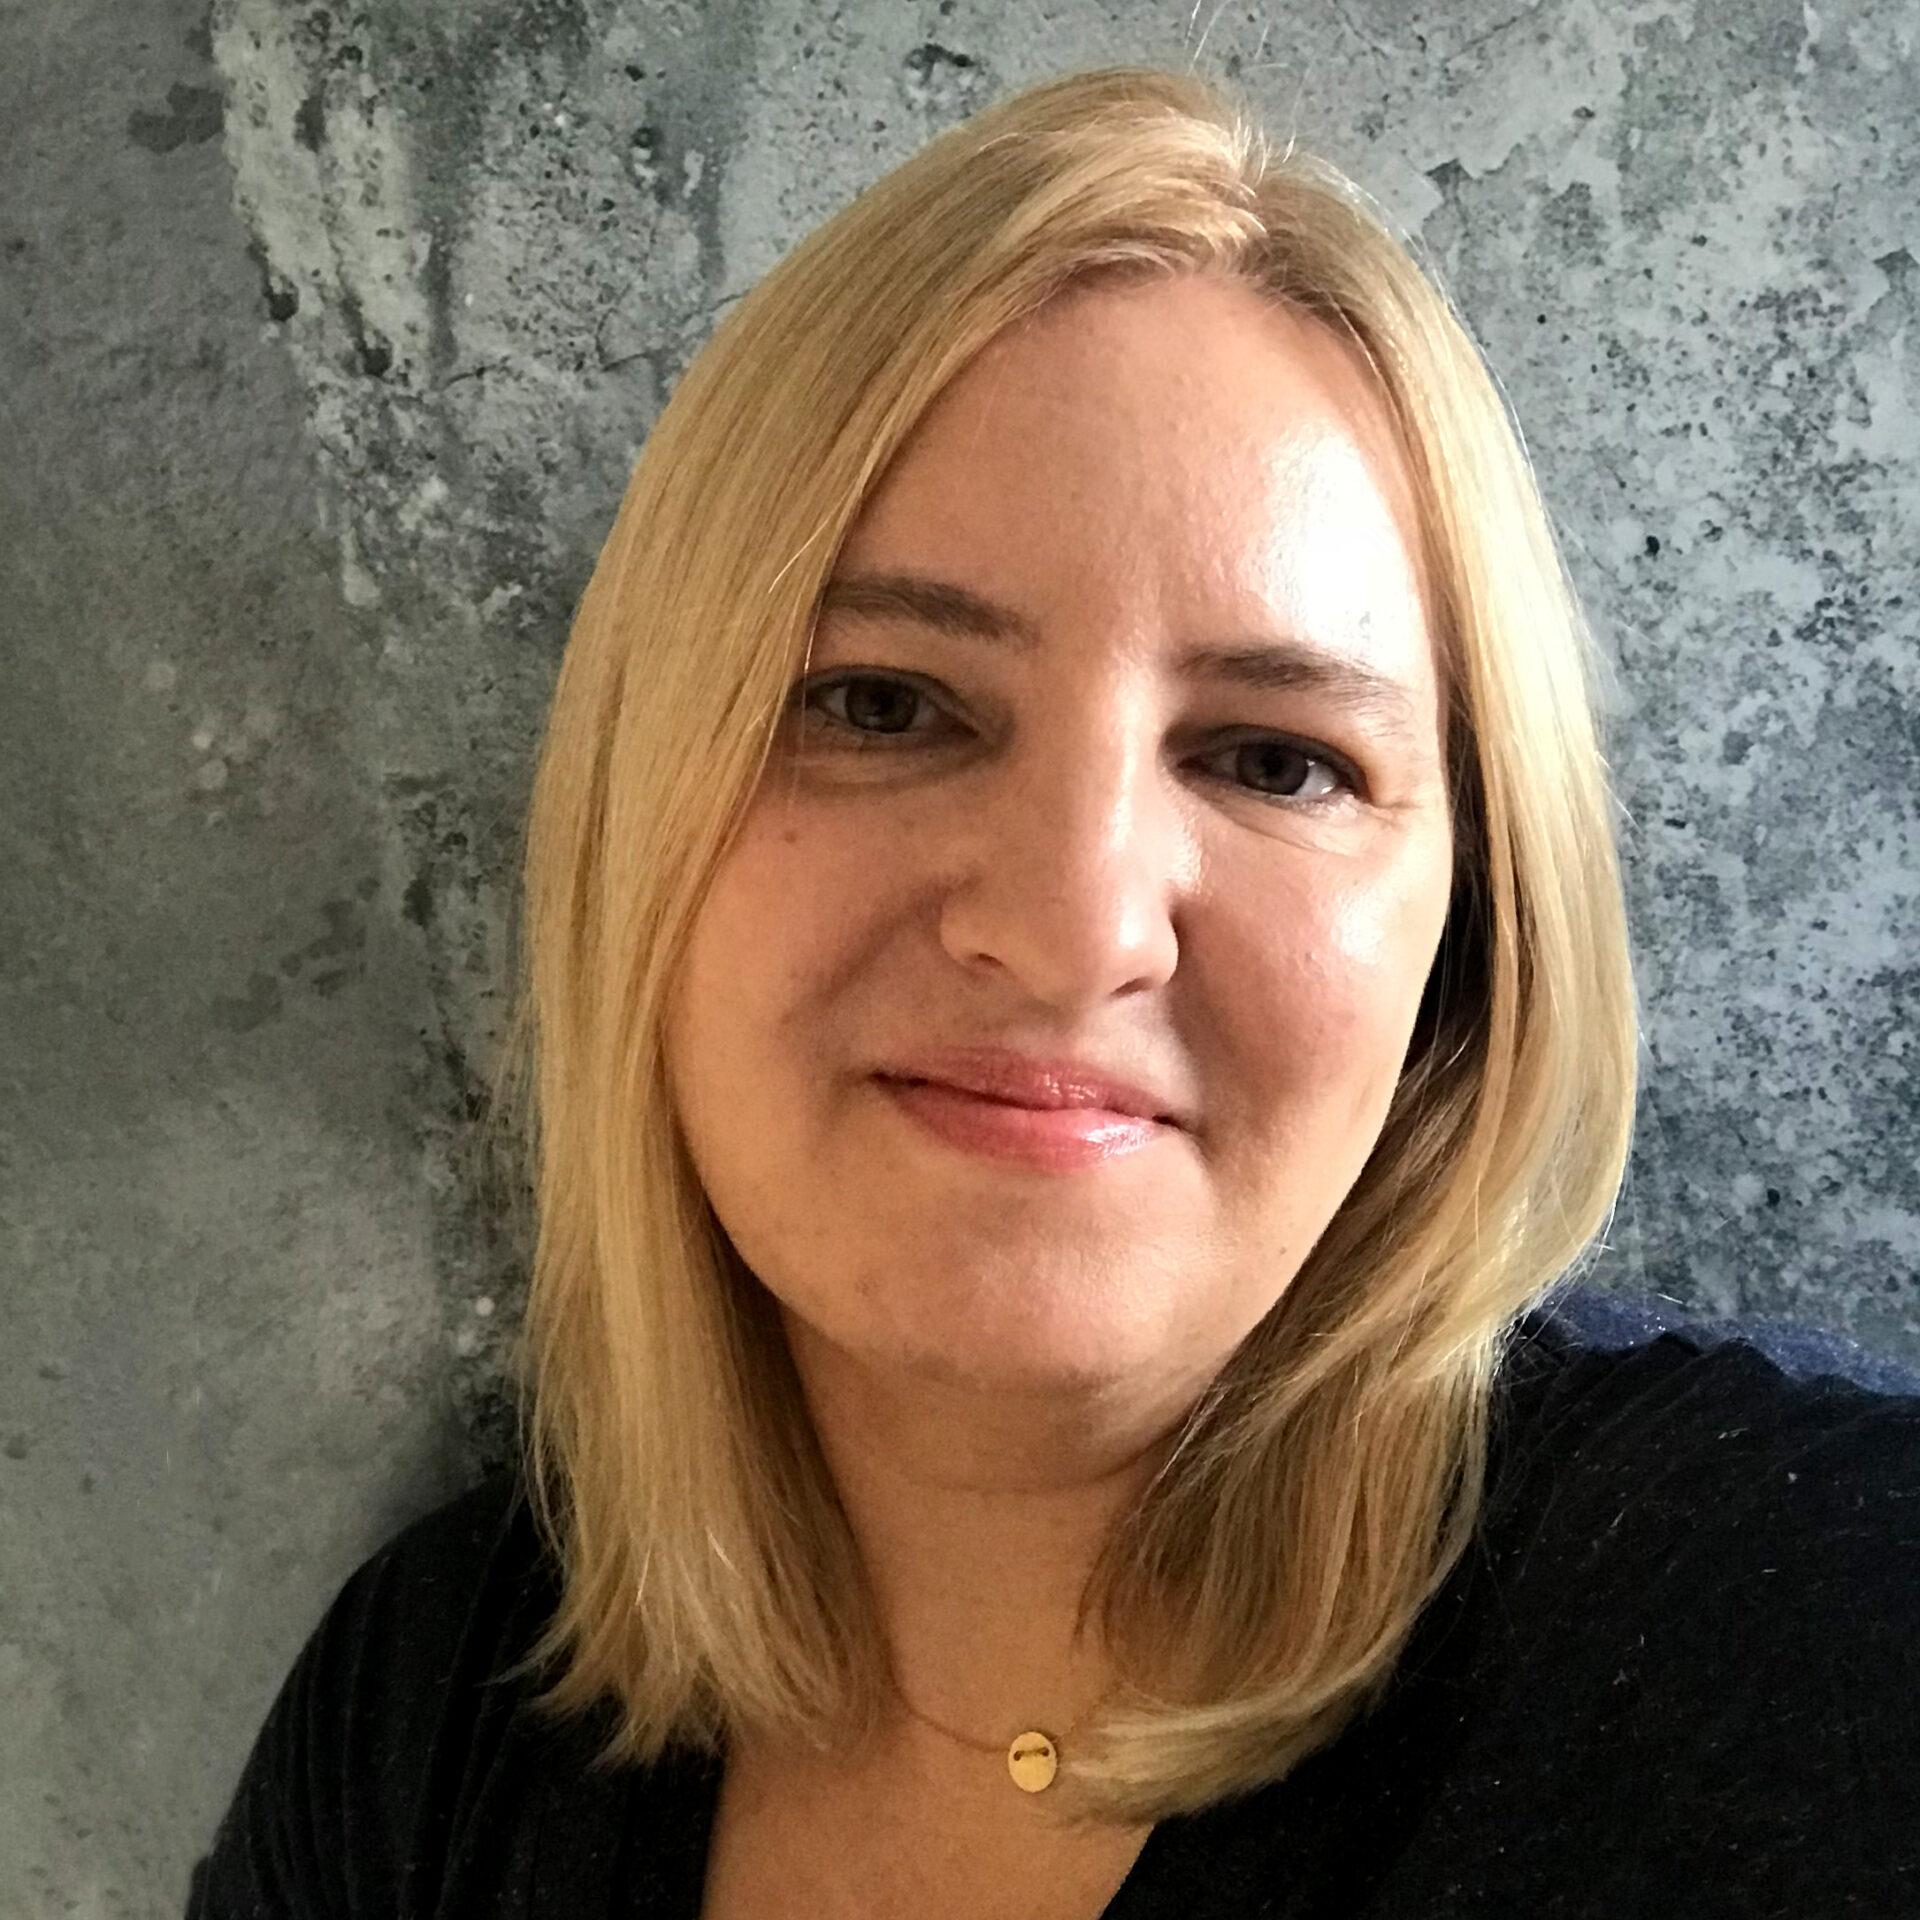 Kirsten Albers